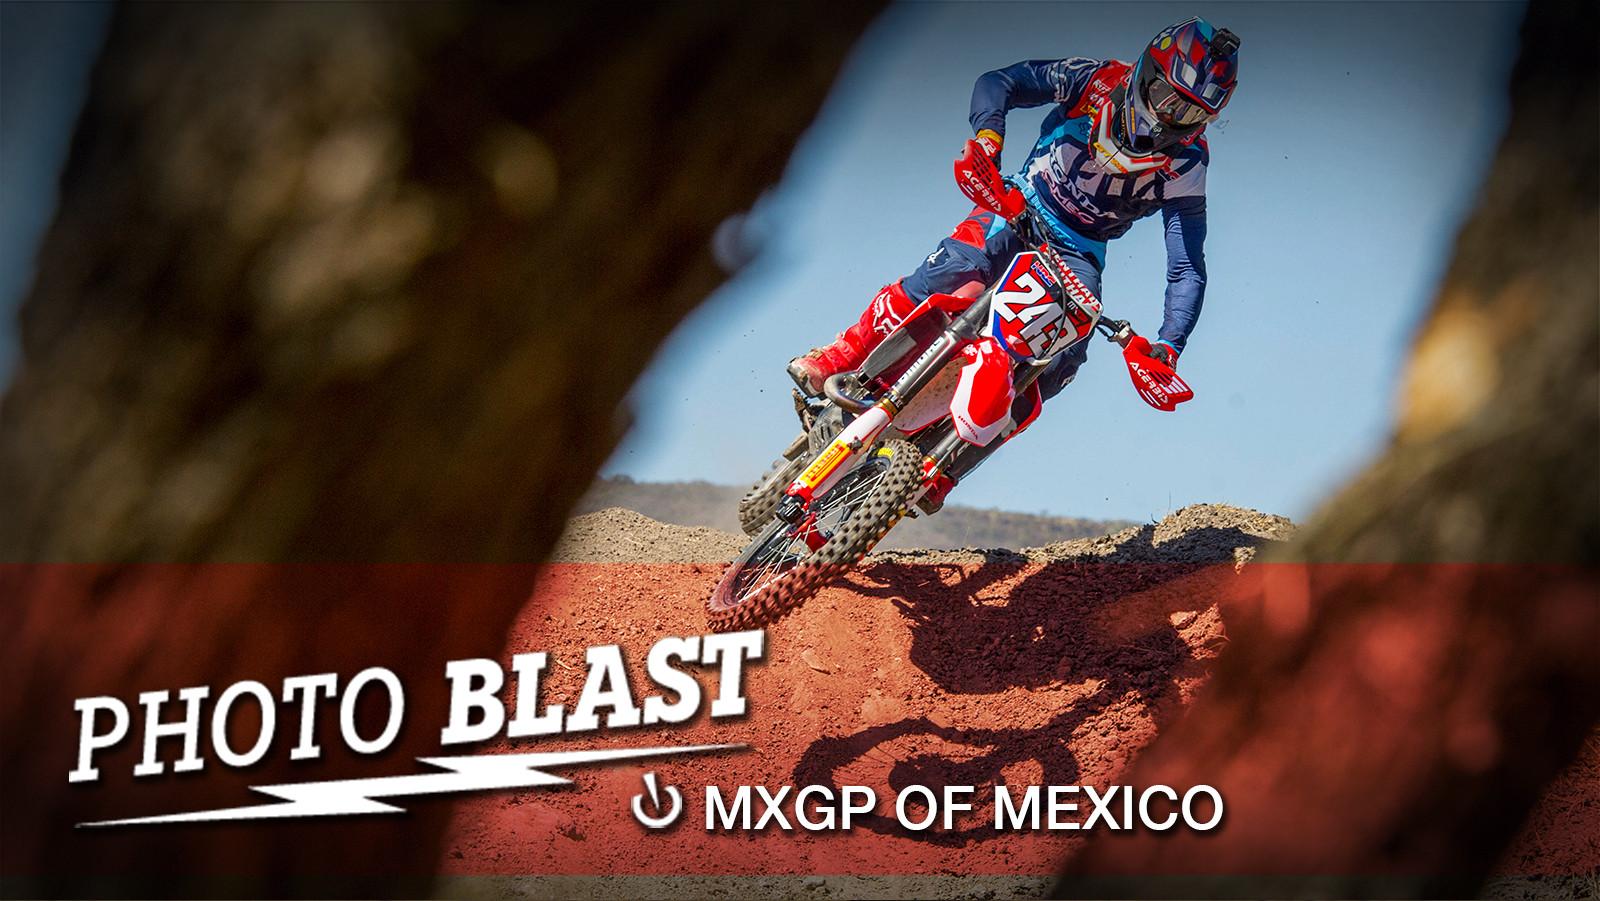 Photo Blast: MXGP of Mexico - Tim Gajser - Photo Blast: 2017 MXGP of Mexico - Motocross Pictures - Vital MX